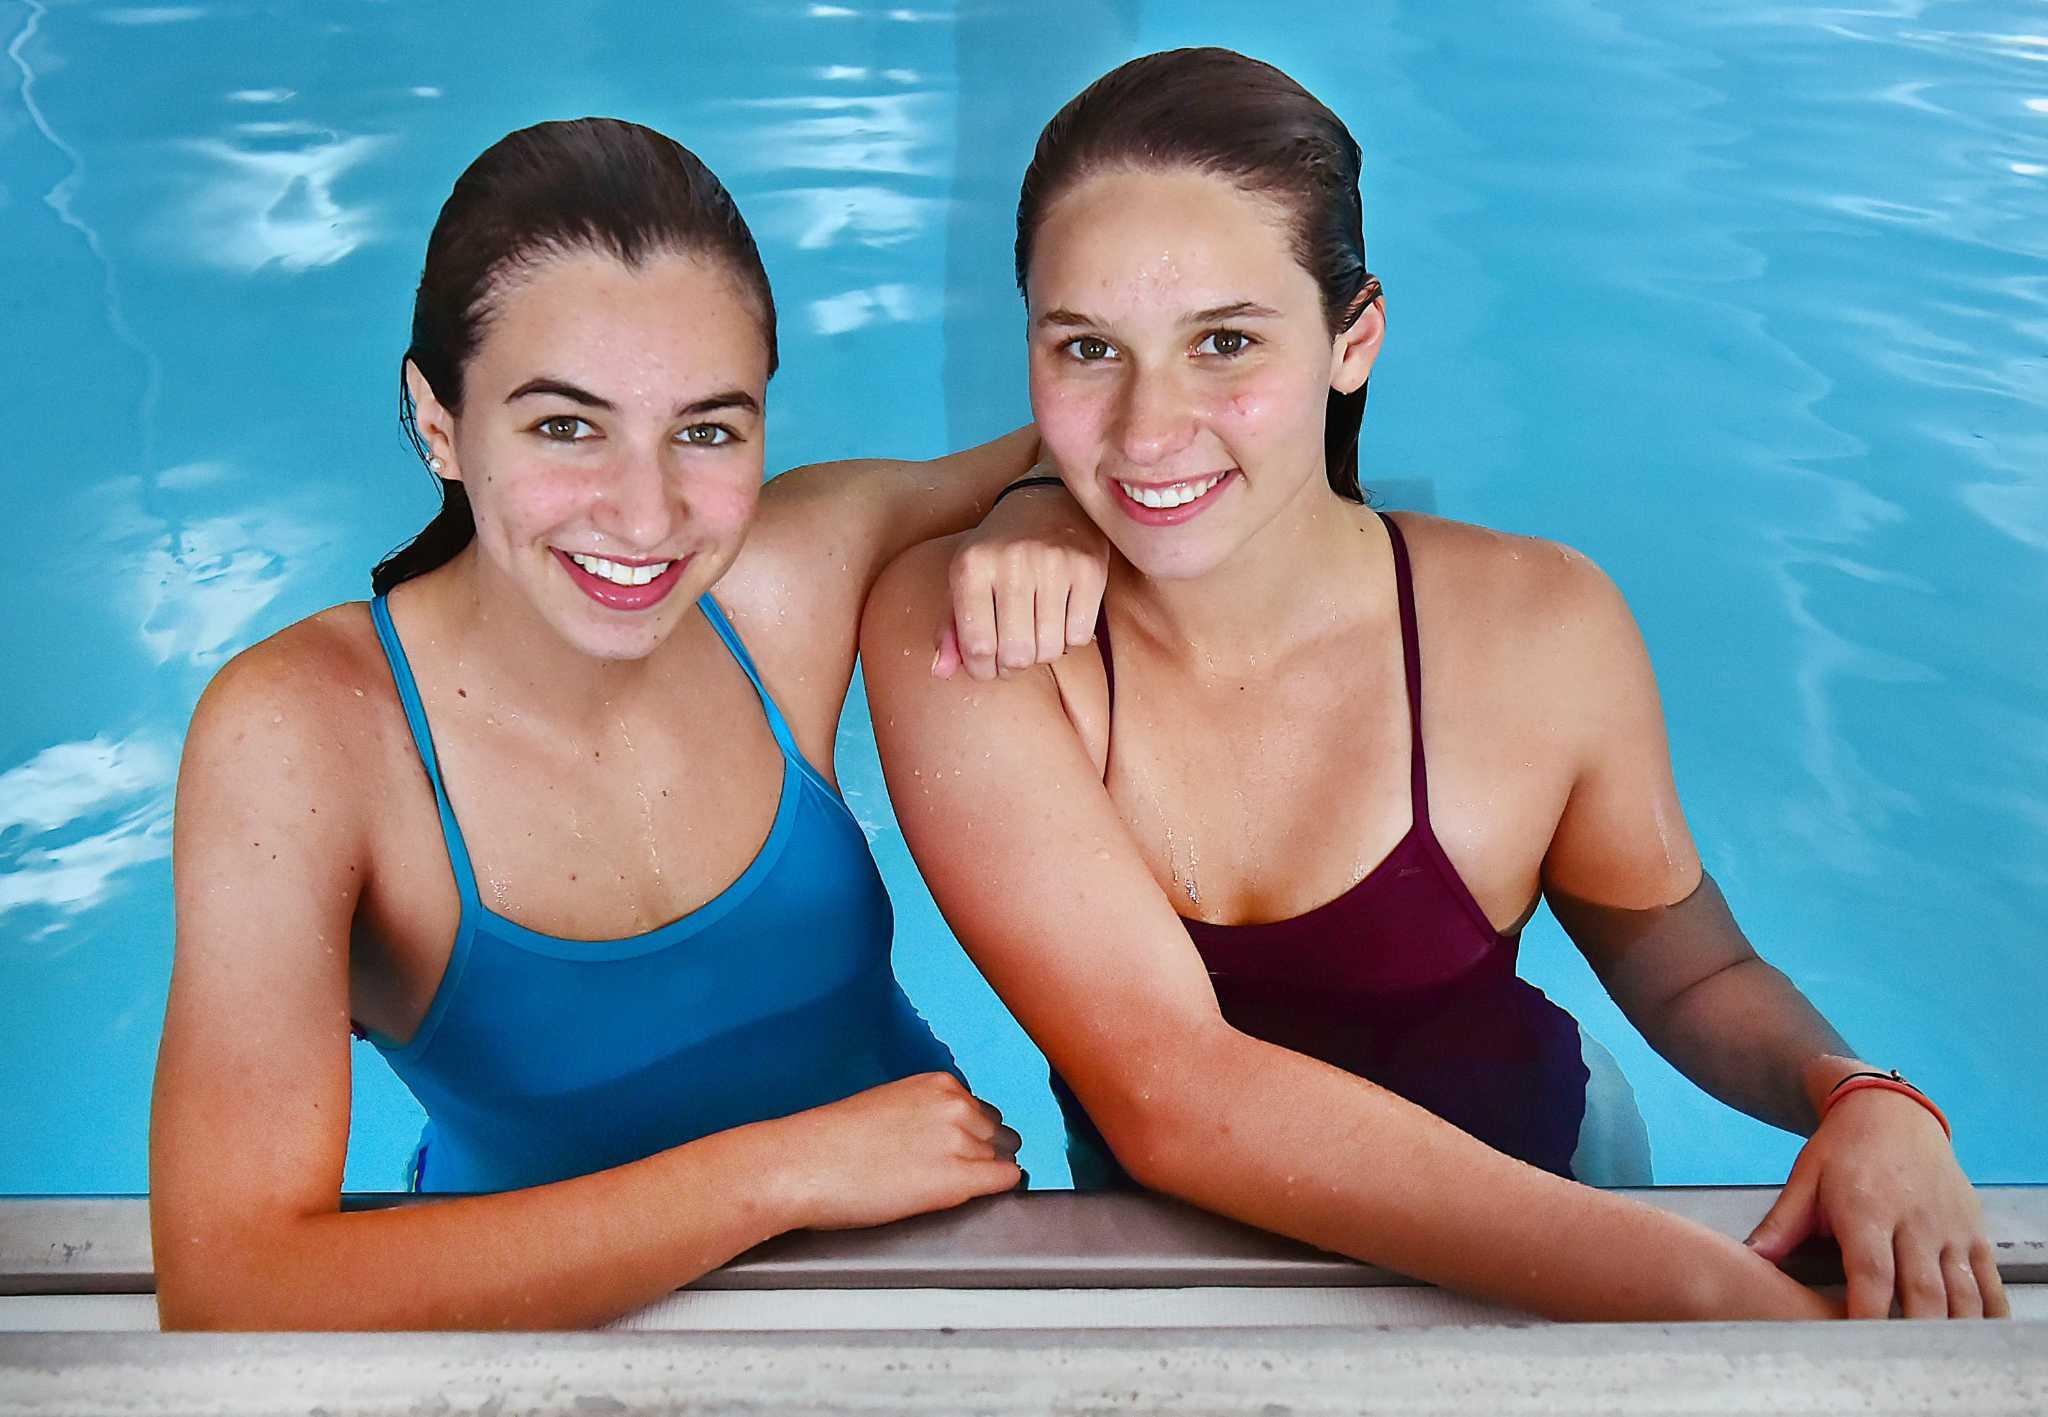 Cfnm swimming lesson free pics